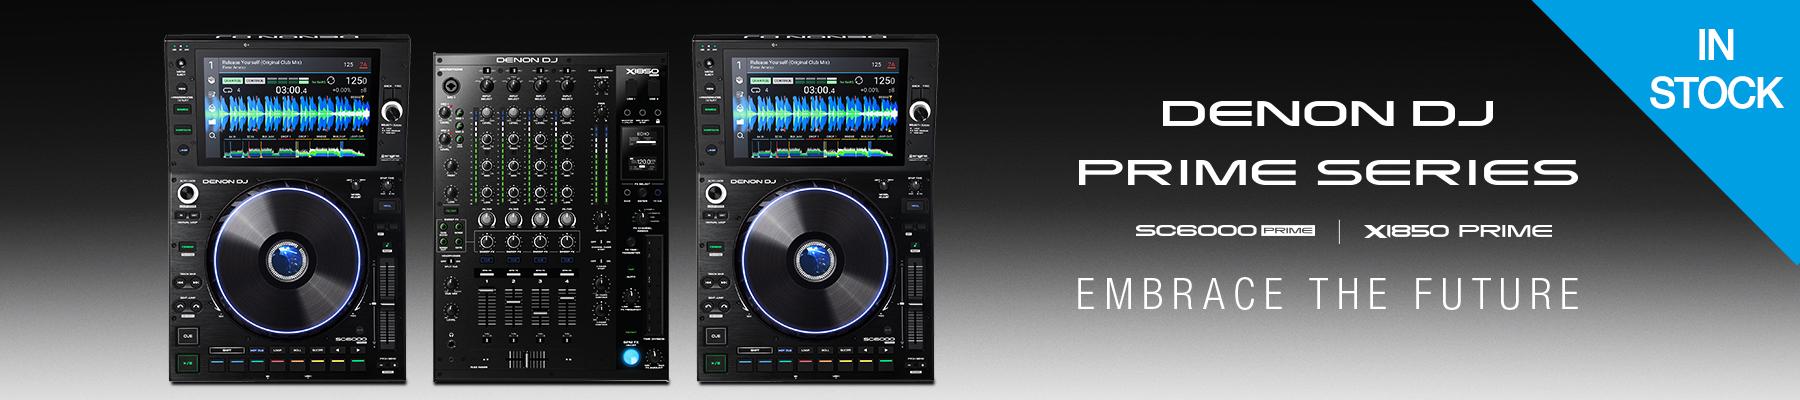 Denon DJ SC6000 & X1850 PRIME Embrace The Future!